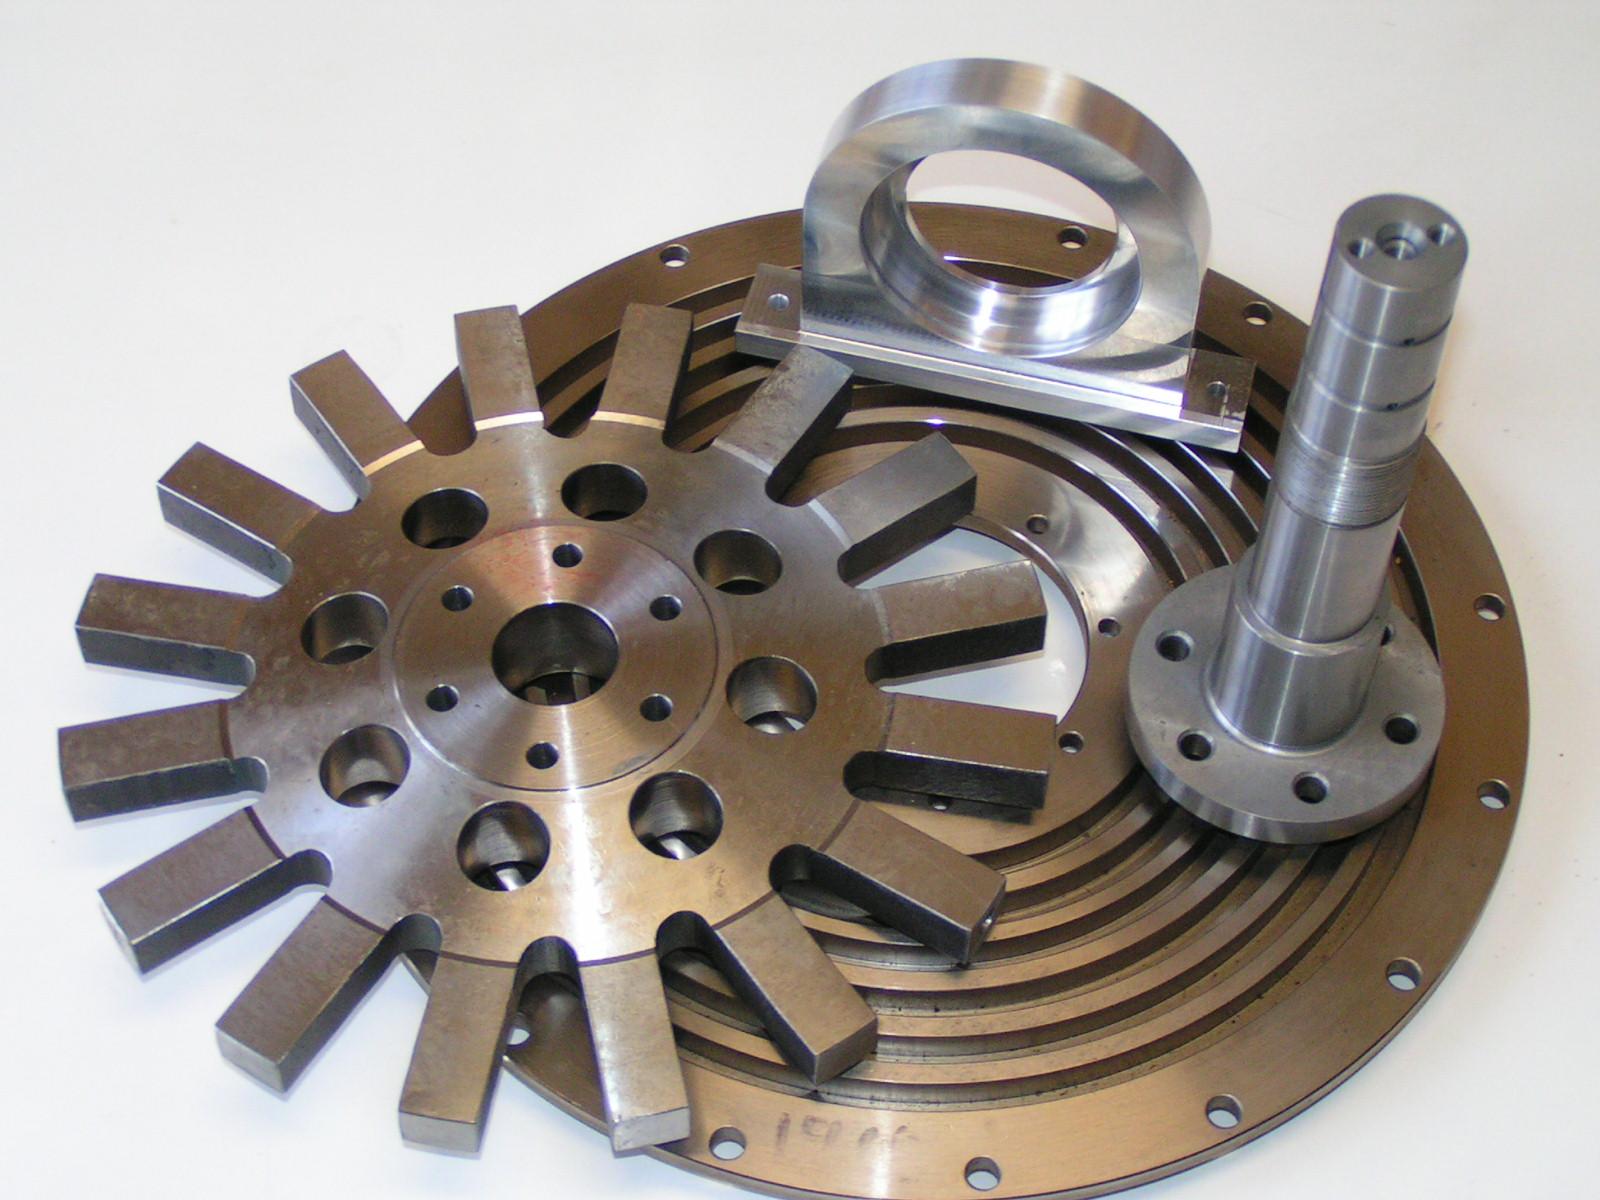 Parts Of A Dynamometer : Dynamometer world loss plates